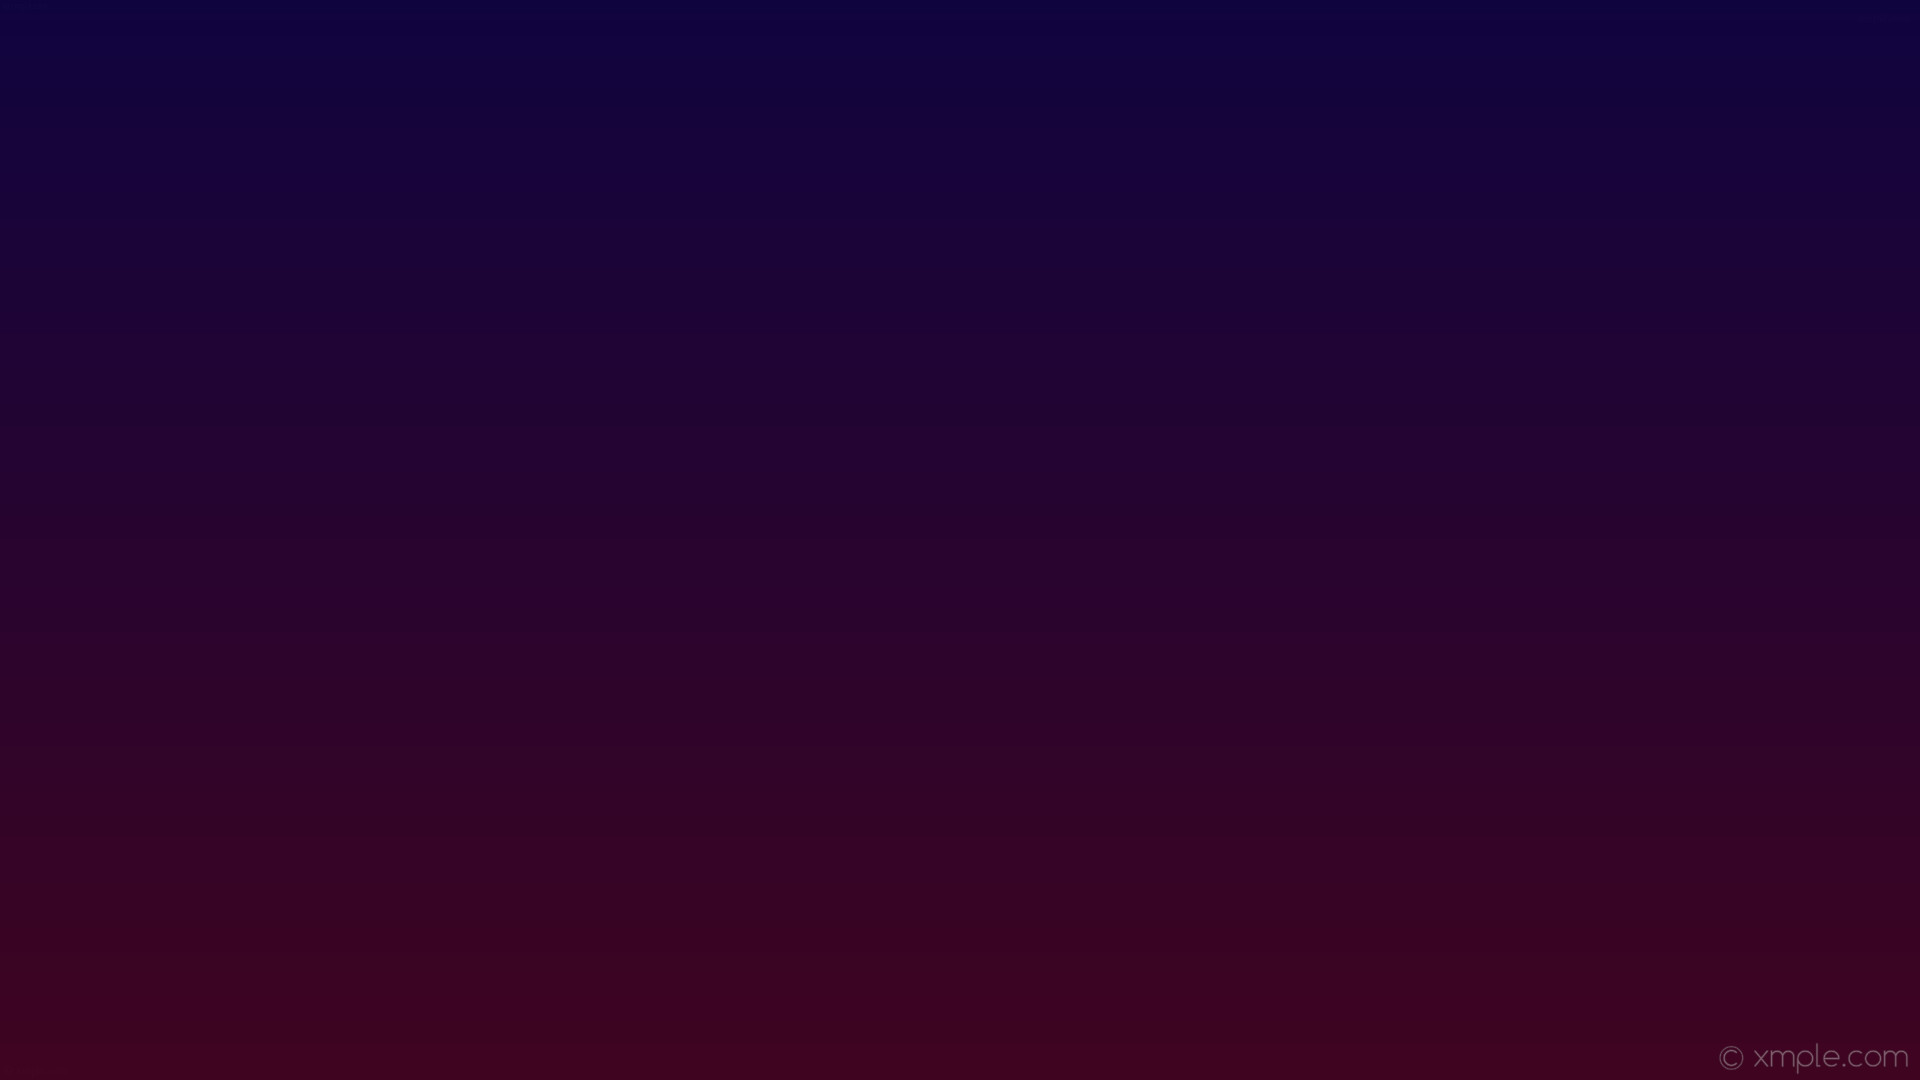 wallpaper gradient linear pink blue dark pink dark blue #3f0420 #10043f 270°